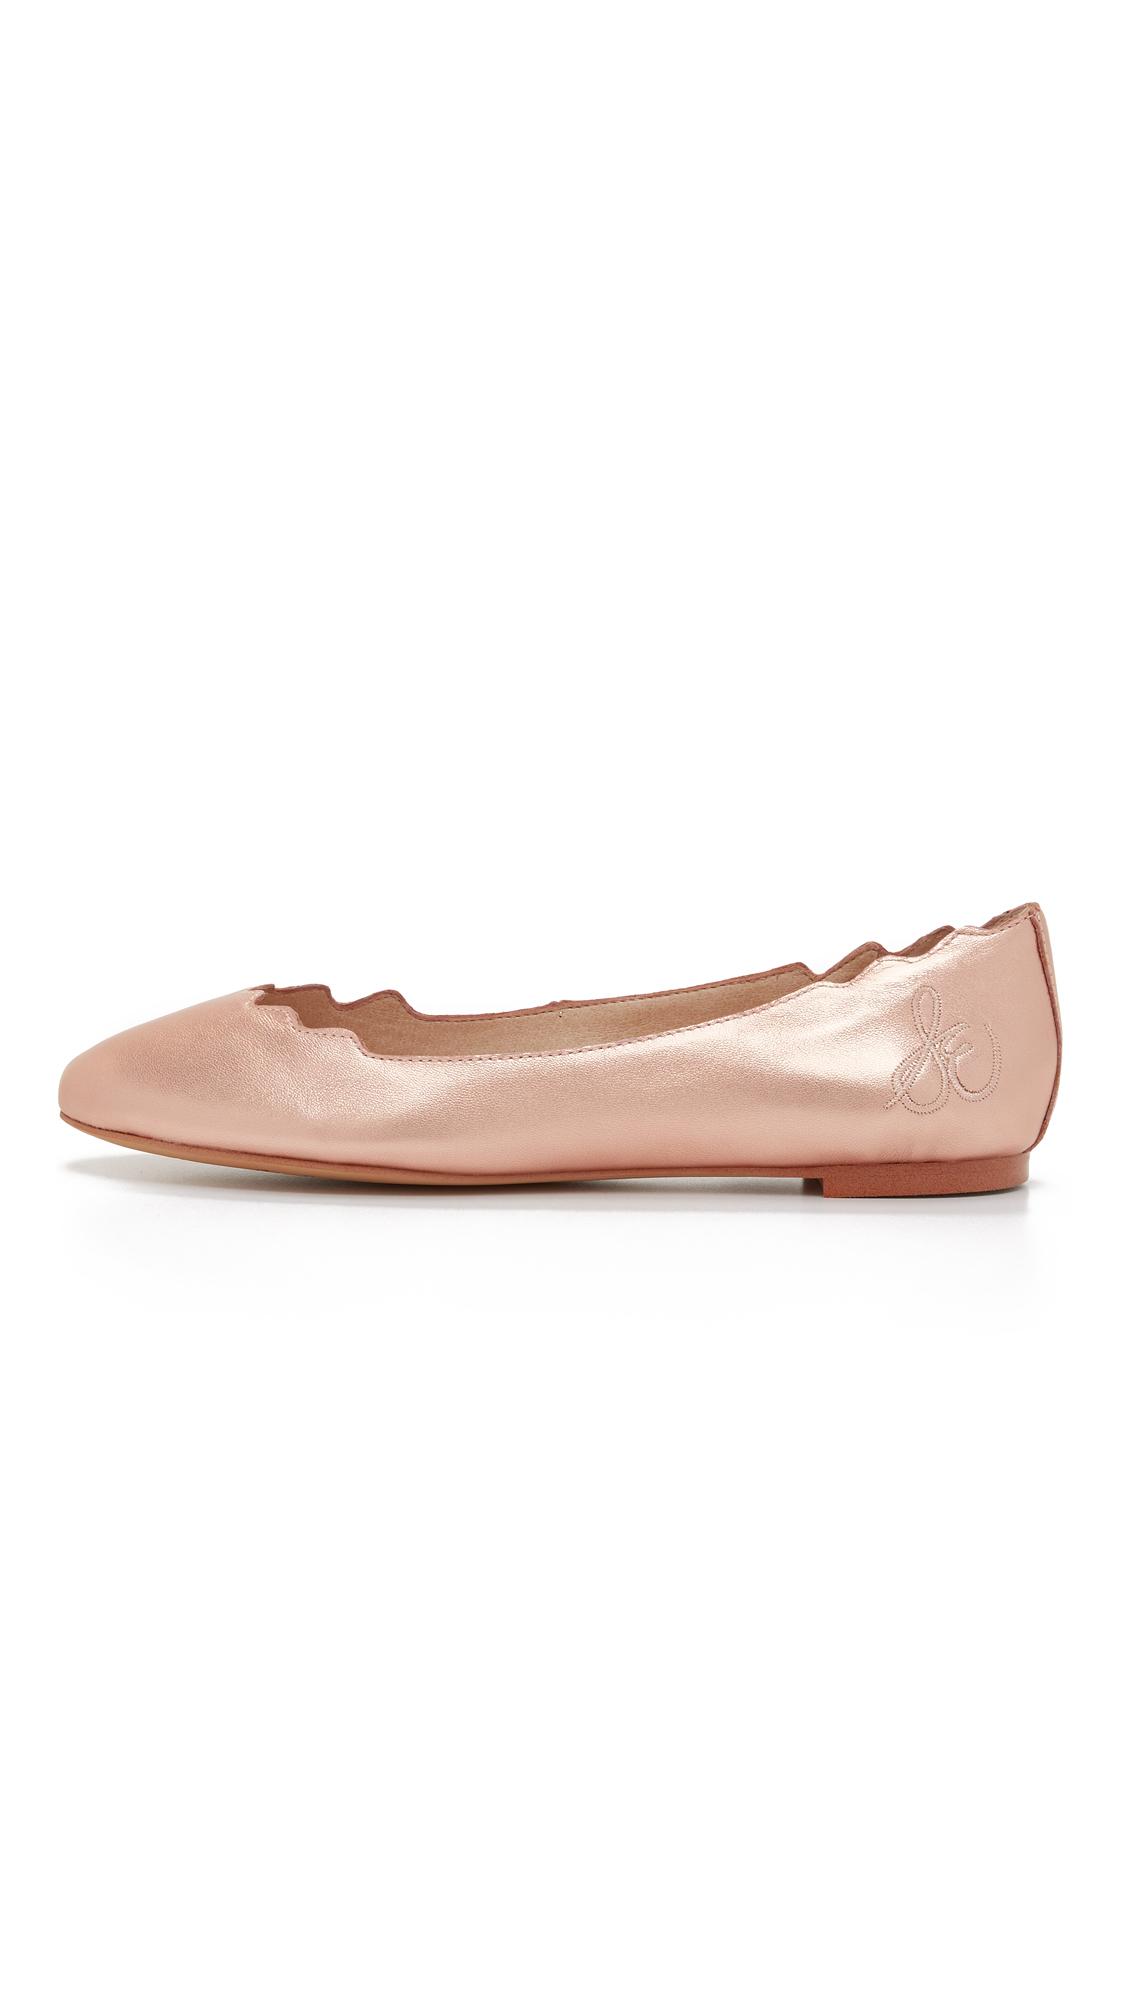 49810af974f15 Sam Edelman Augusta Scalloped Ballet Flats in Pink - Lyst